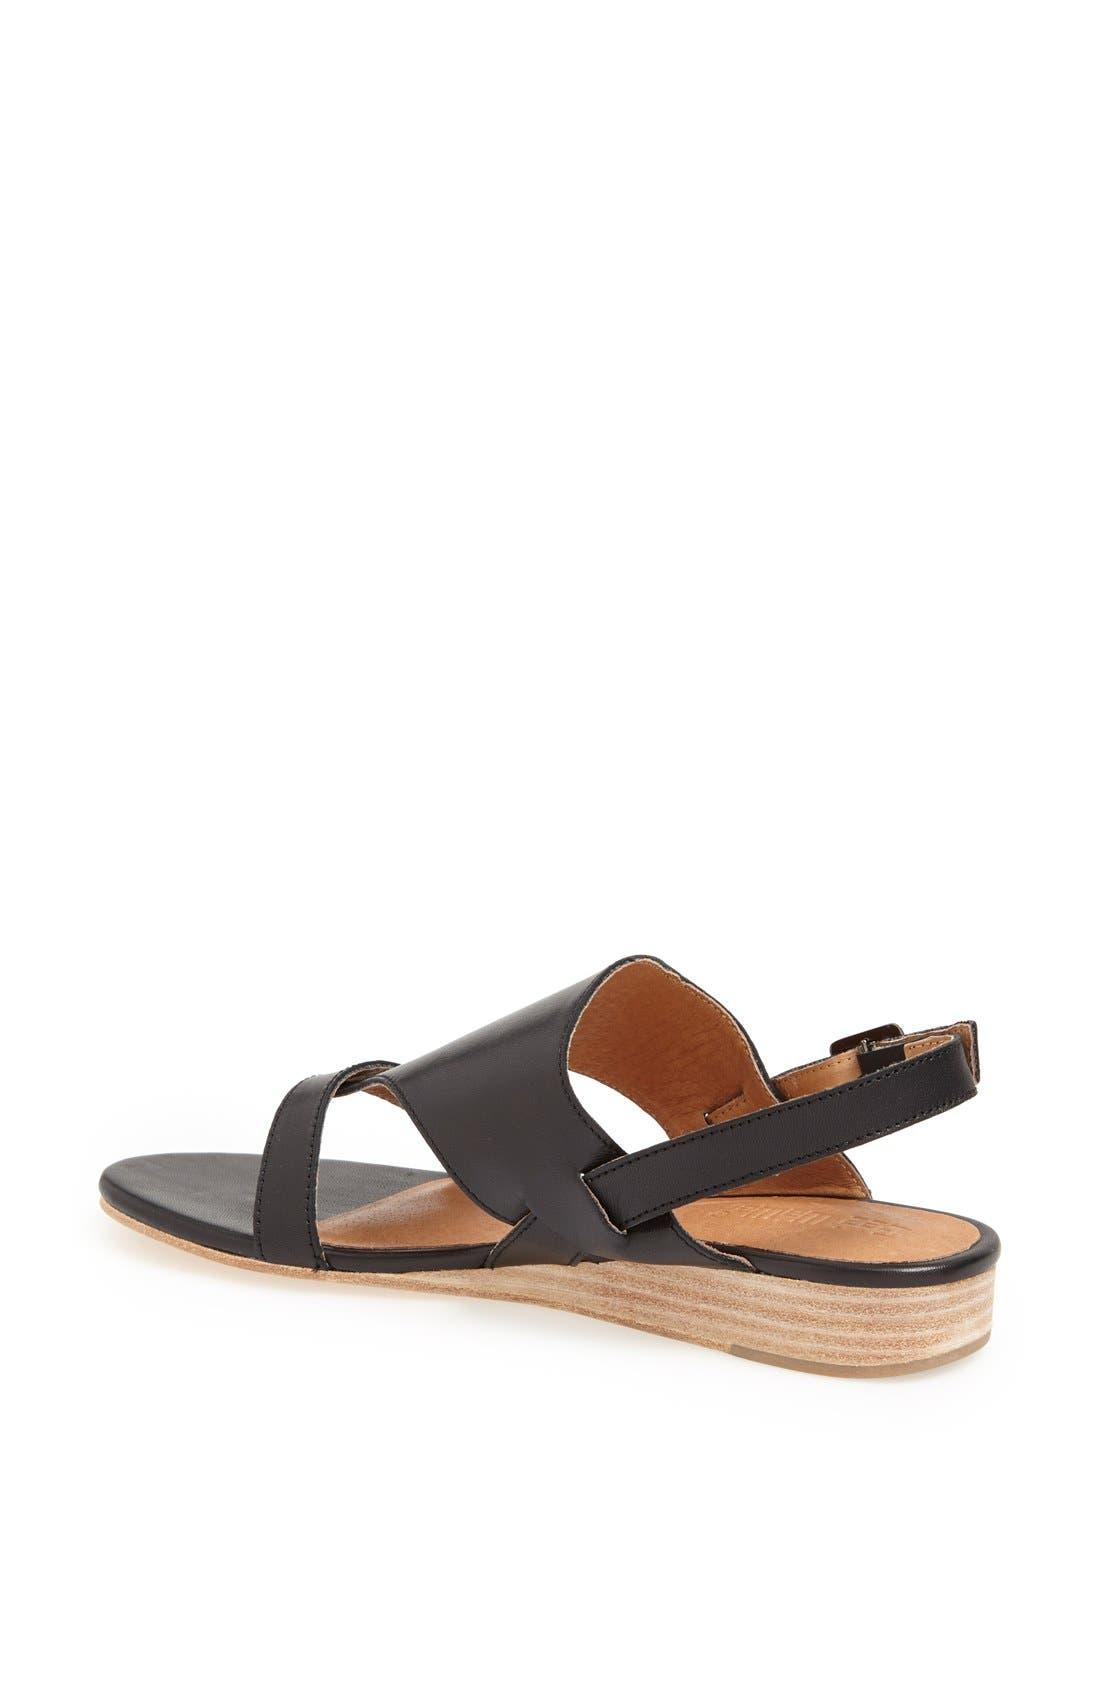 Alternate Image 2  - Gee WaWa 'Dany' Sandal